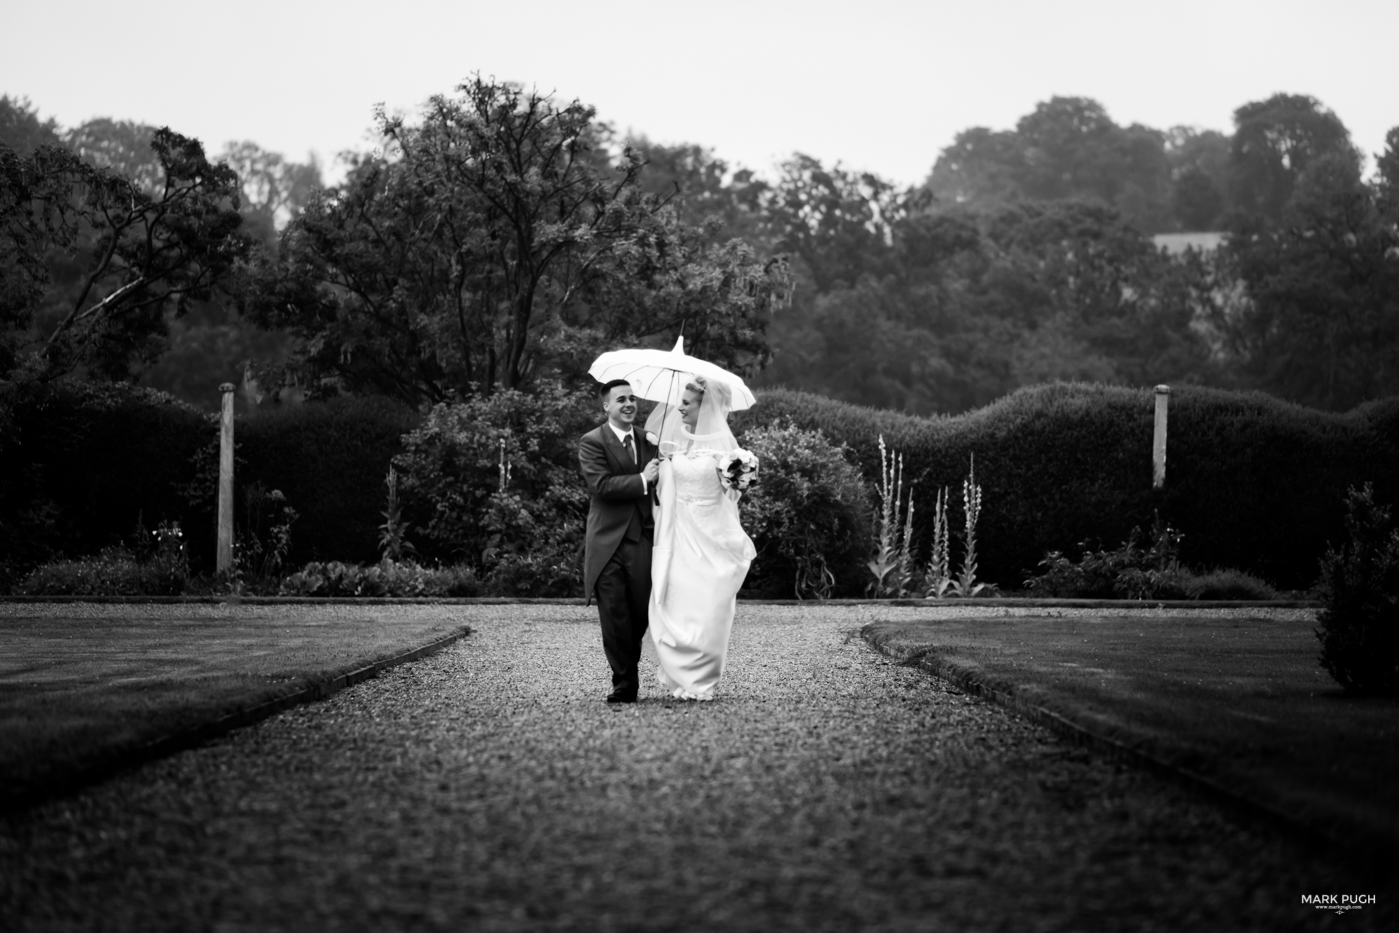 093 Wedding Photography Award winning Wedding Photographer and Videographer Mark Pugh www.markpugh.com.JPG